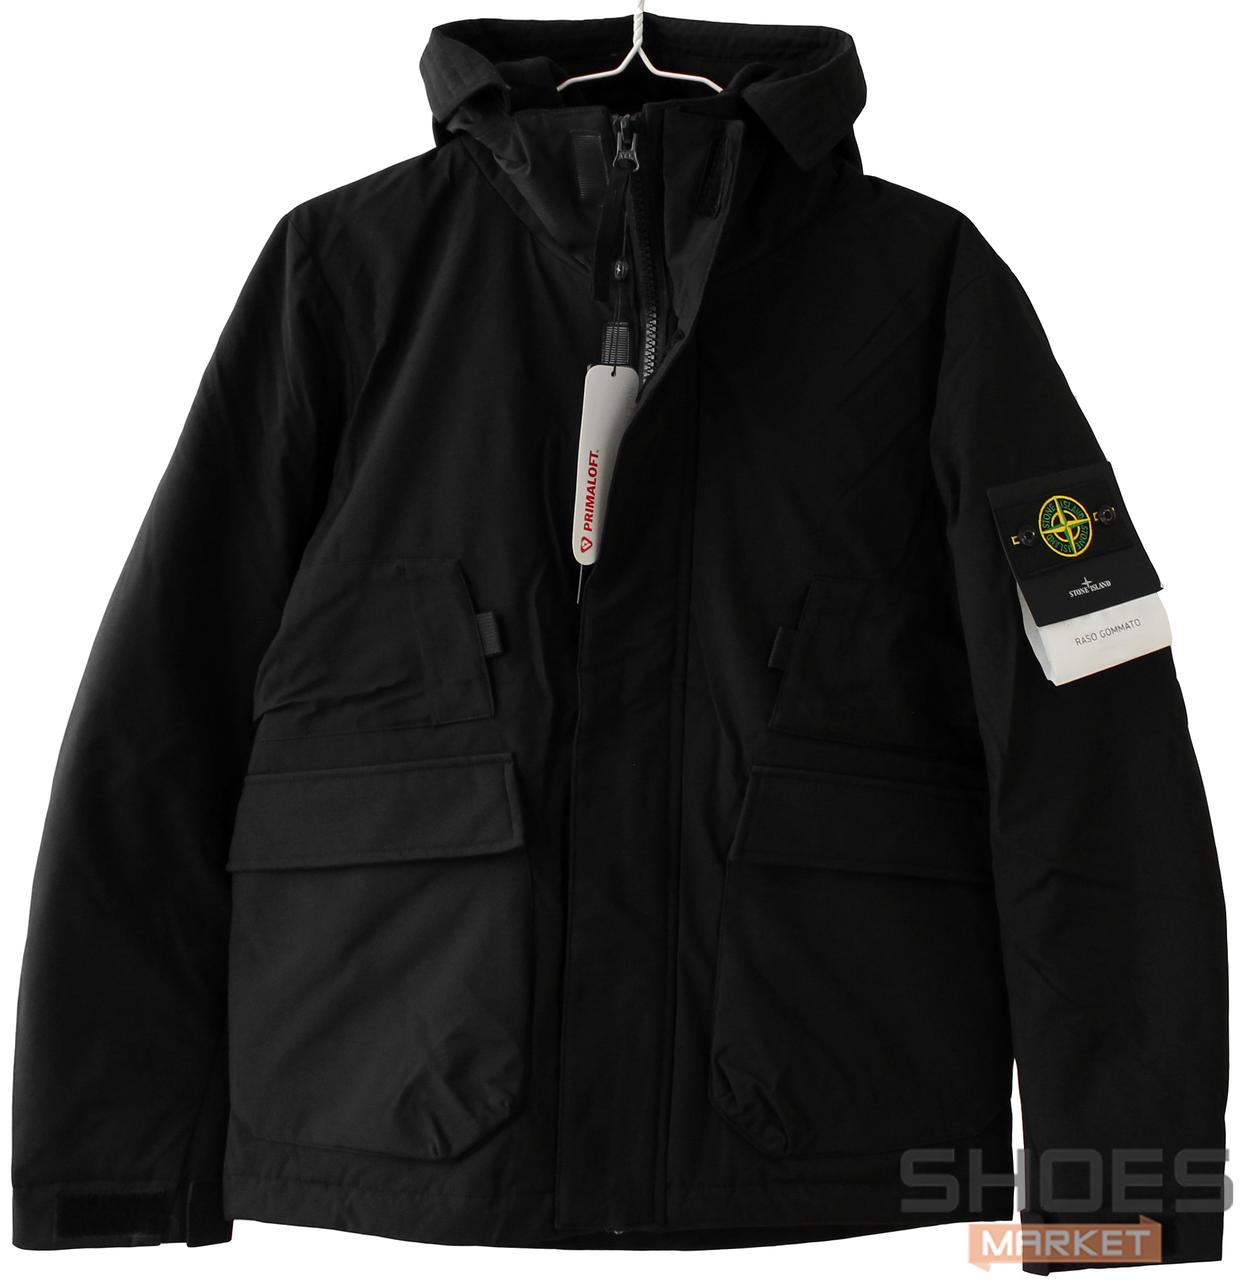 c1bb1cb8eb4 Куртка Stone Island Black (ориг.бирка) - Интернет-магазин обуви и одежды